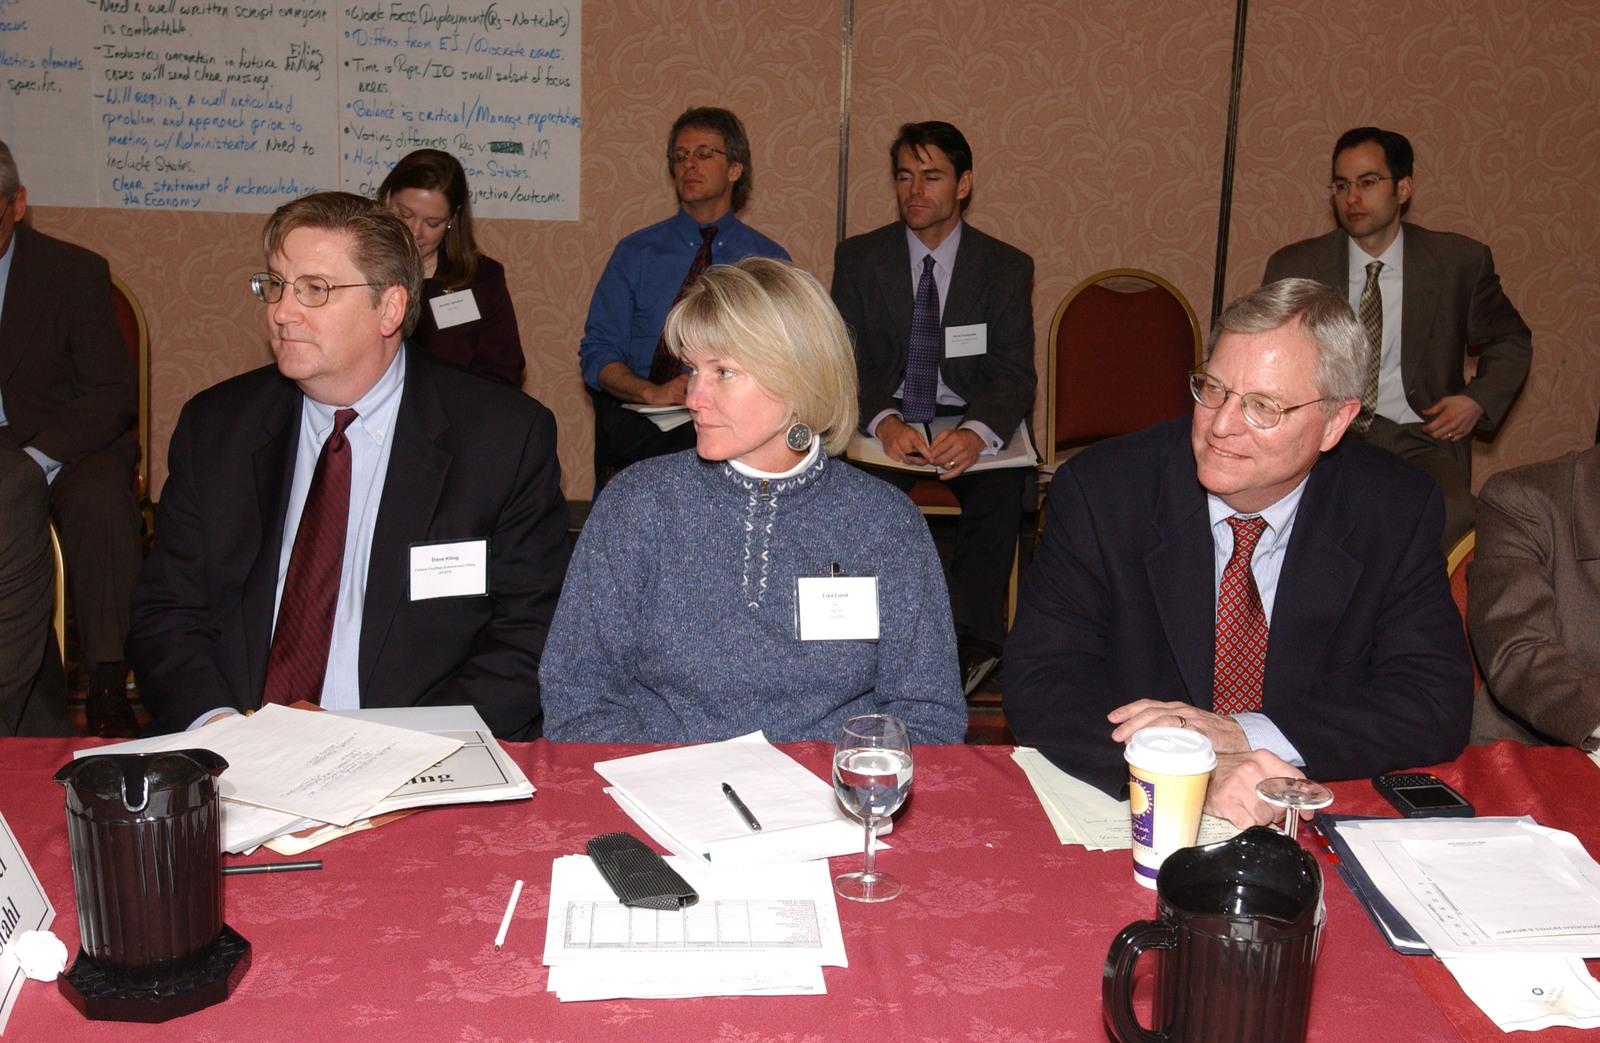 Mike Leavitt addresses National Association of Manufacturers